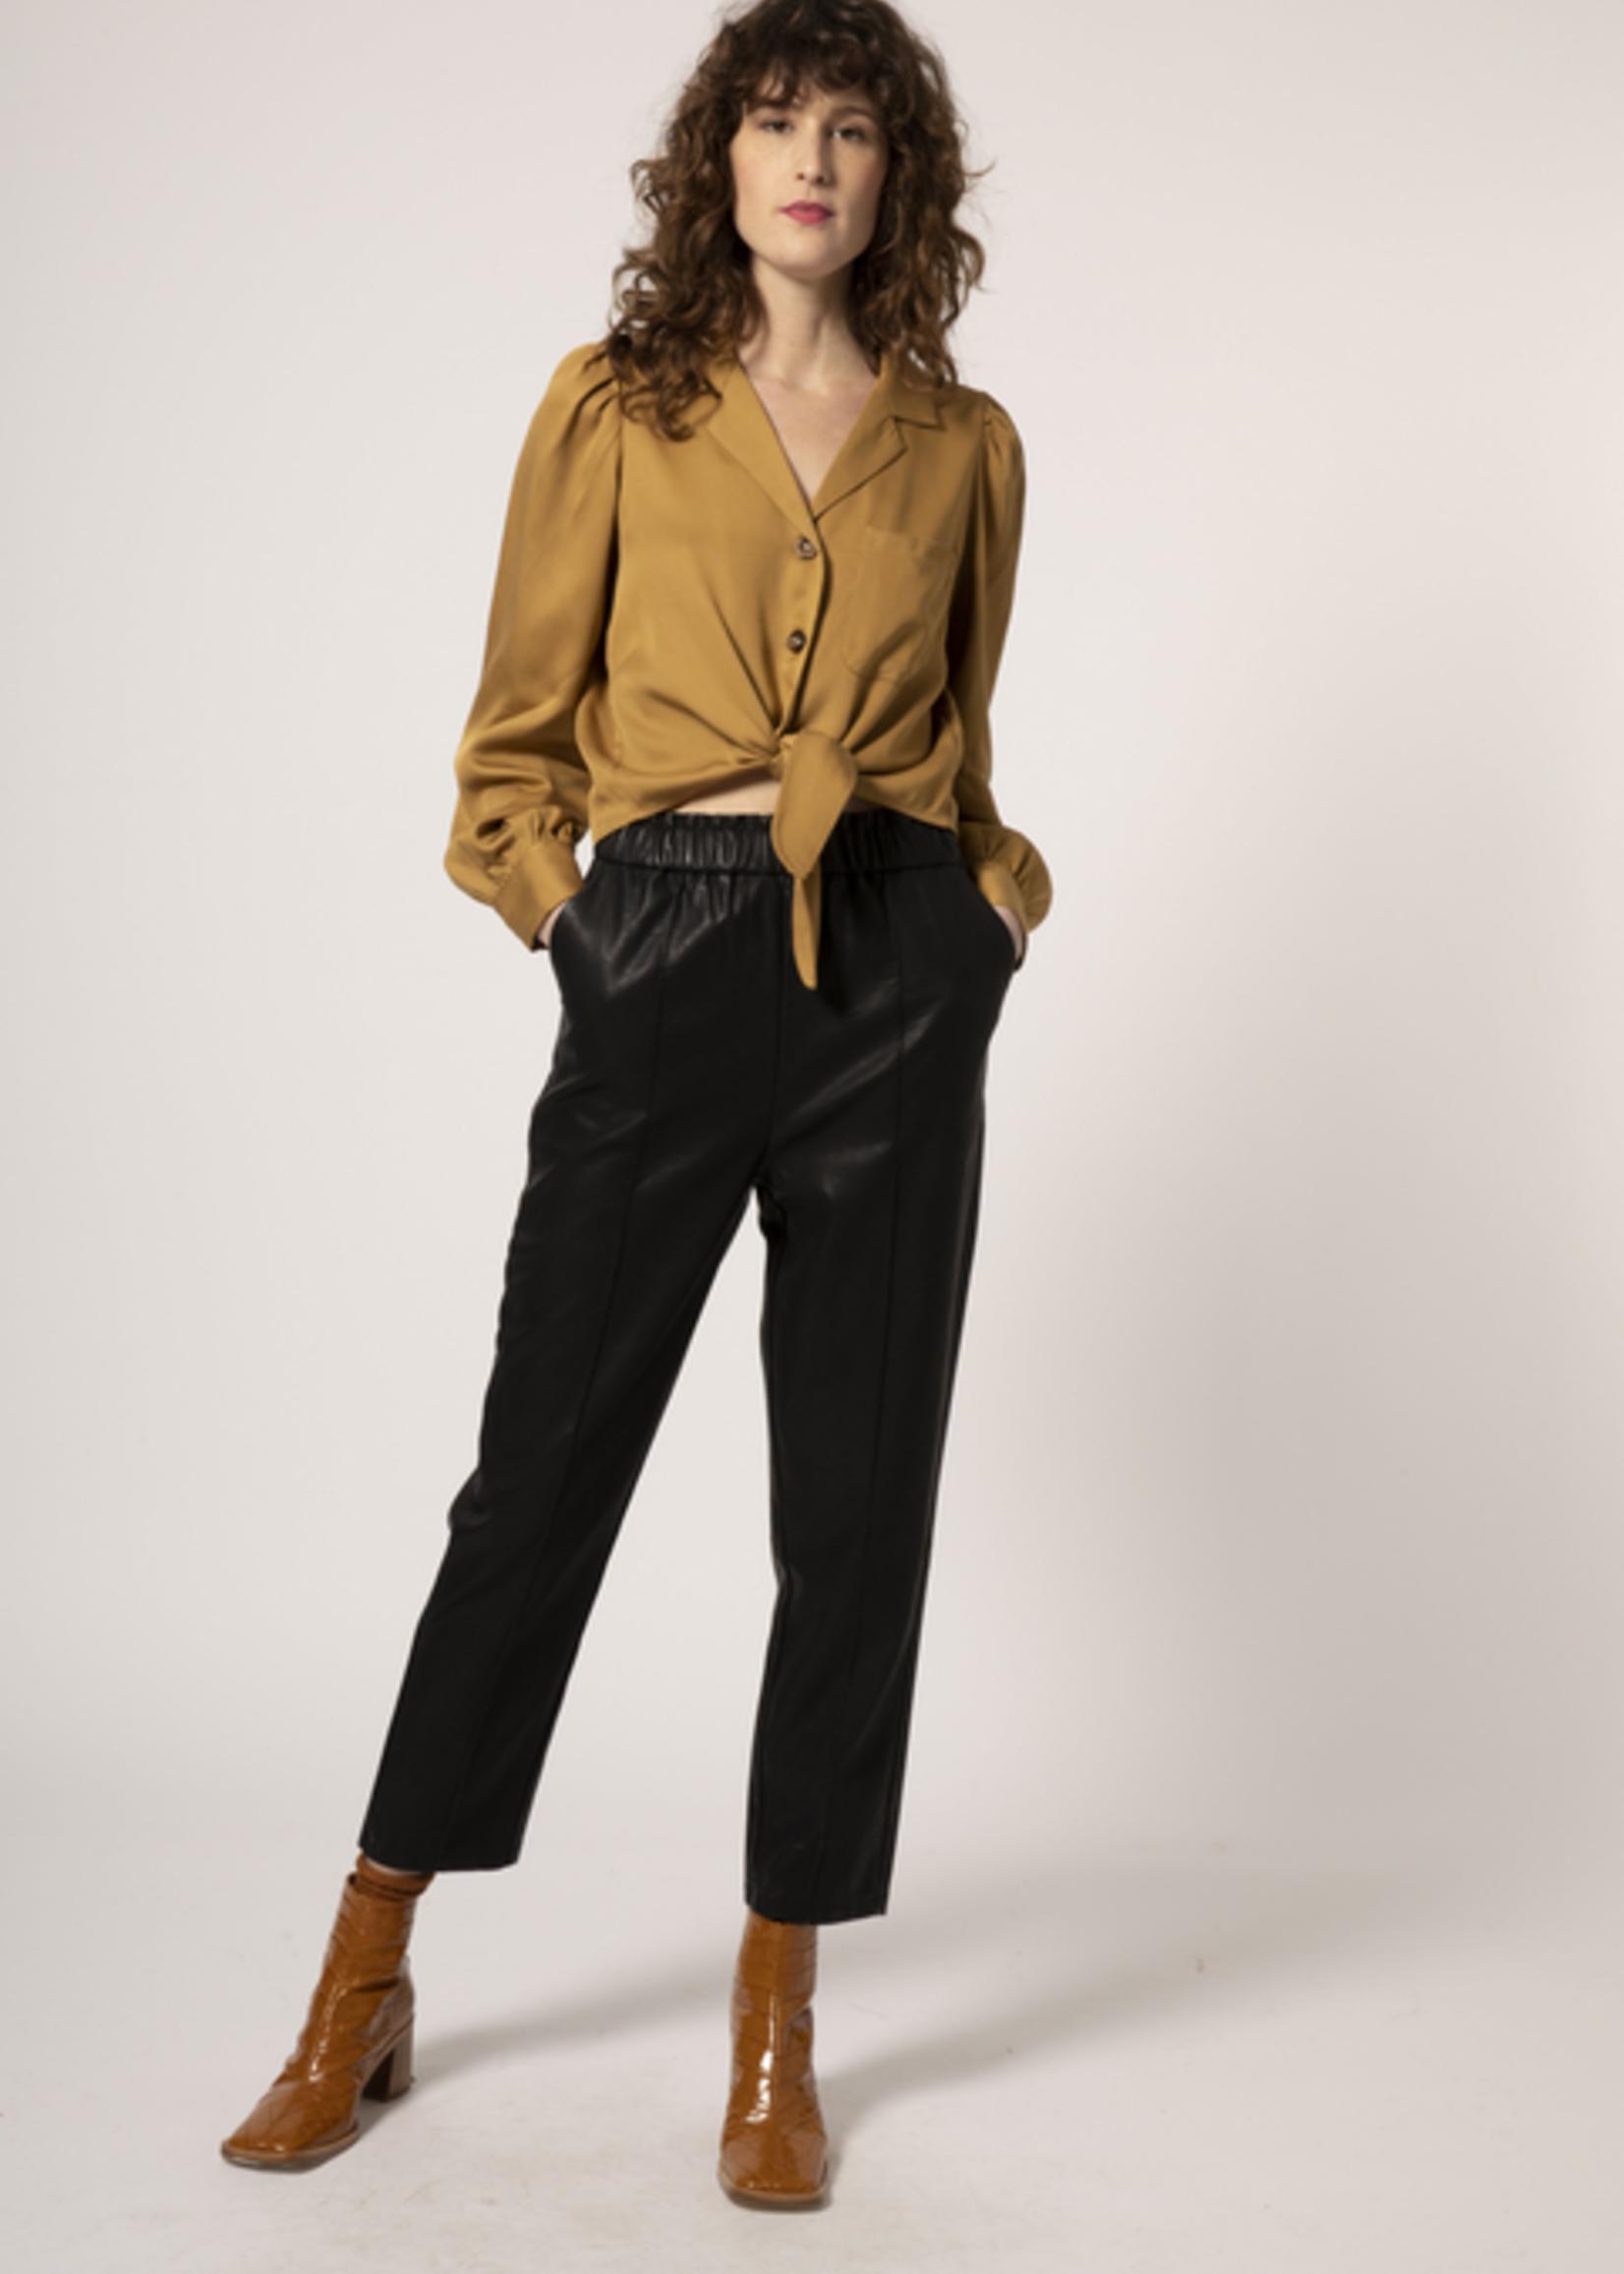 Elitaire Boutique Casablanca Tie-Front Button Up in Ocre